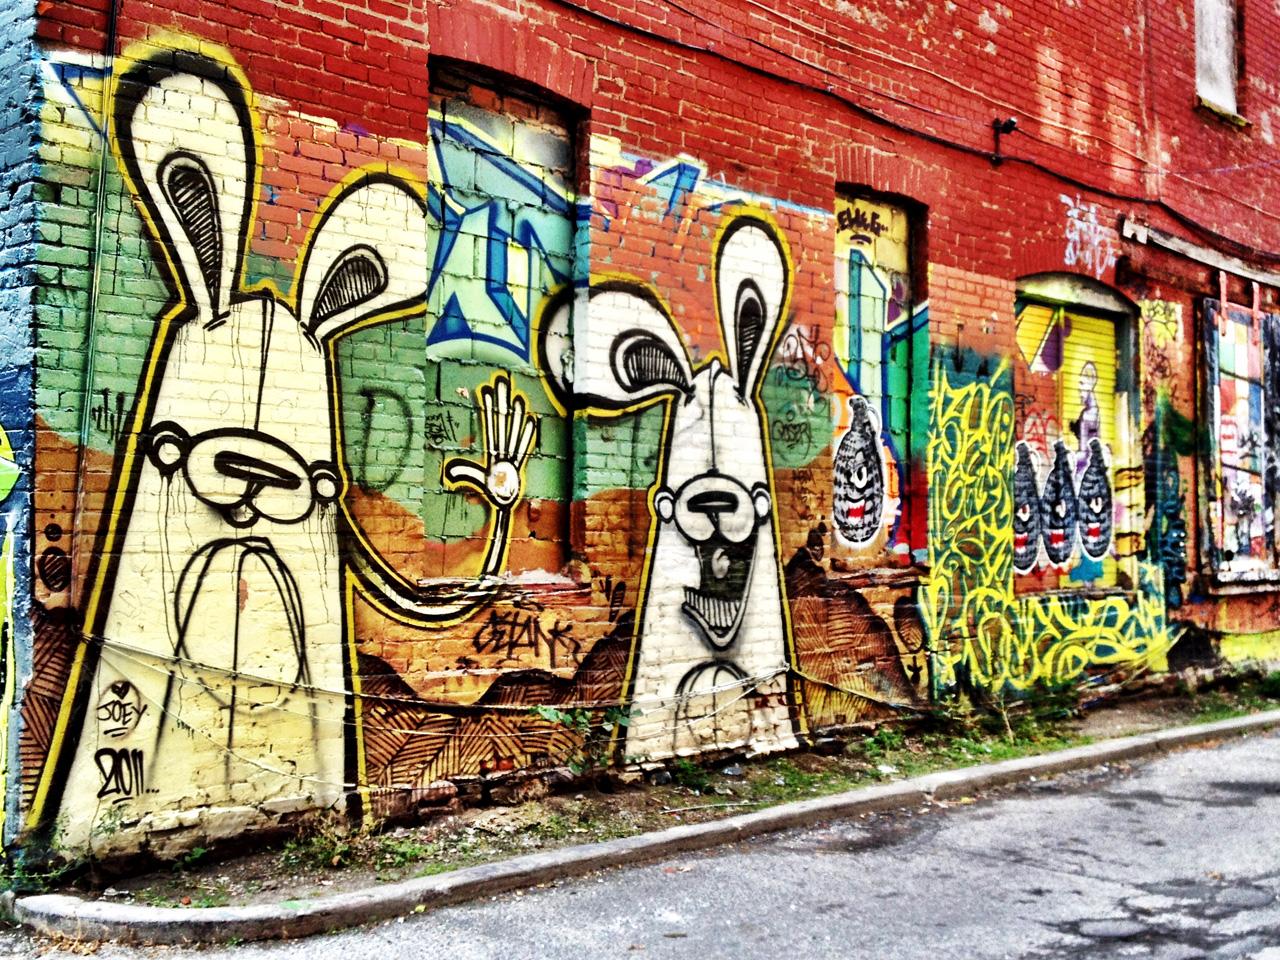 Graffiti wall toronto downtown - Graffiti Alley Street Art Toronto